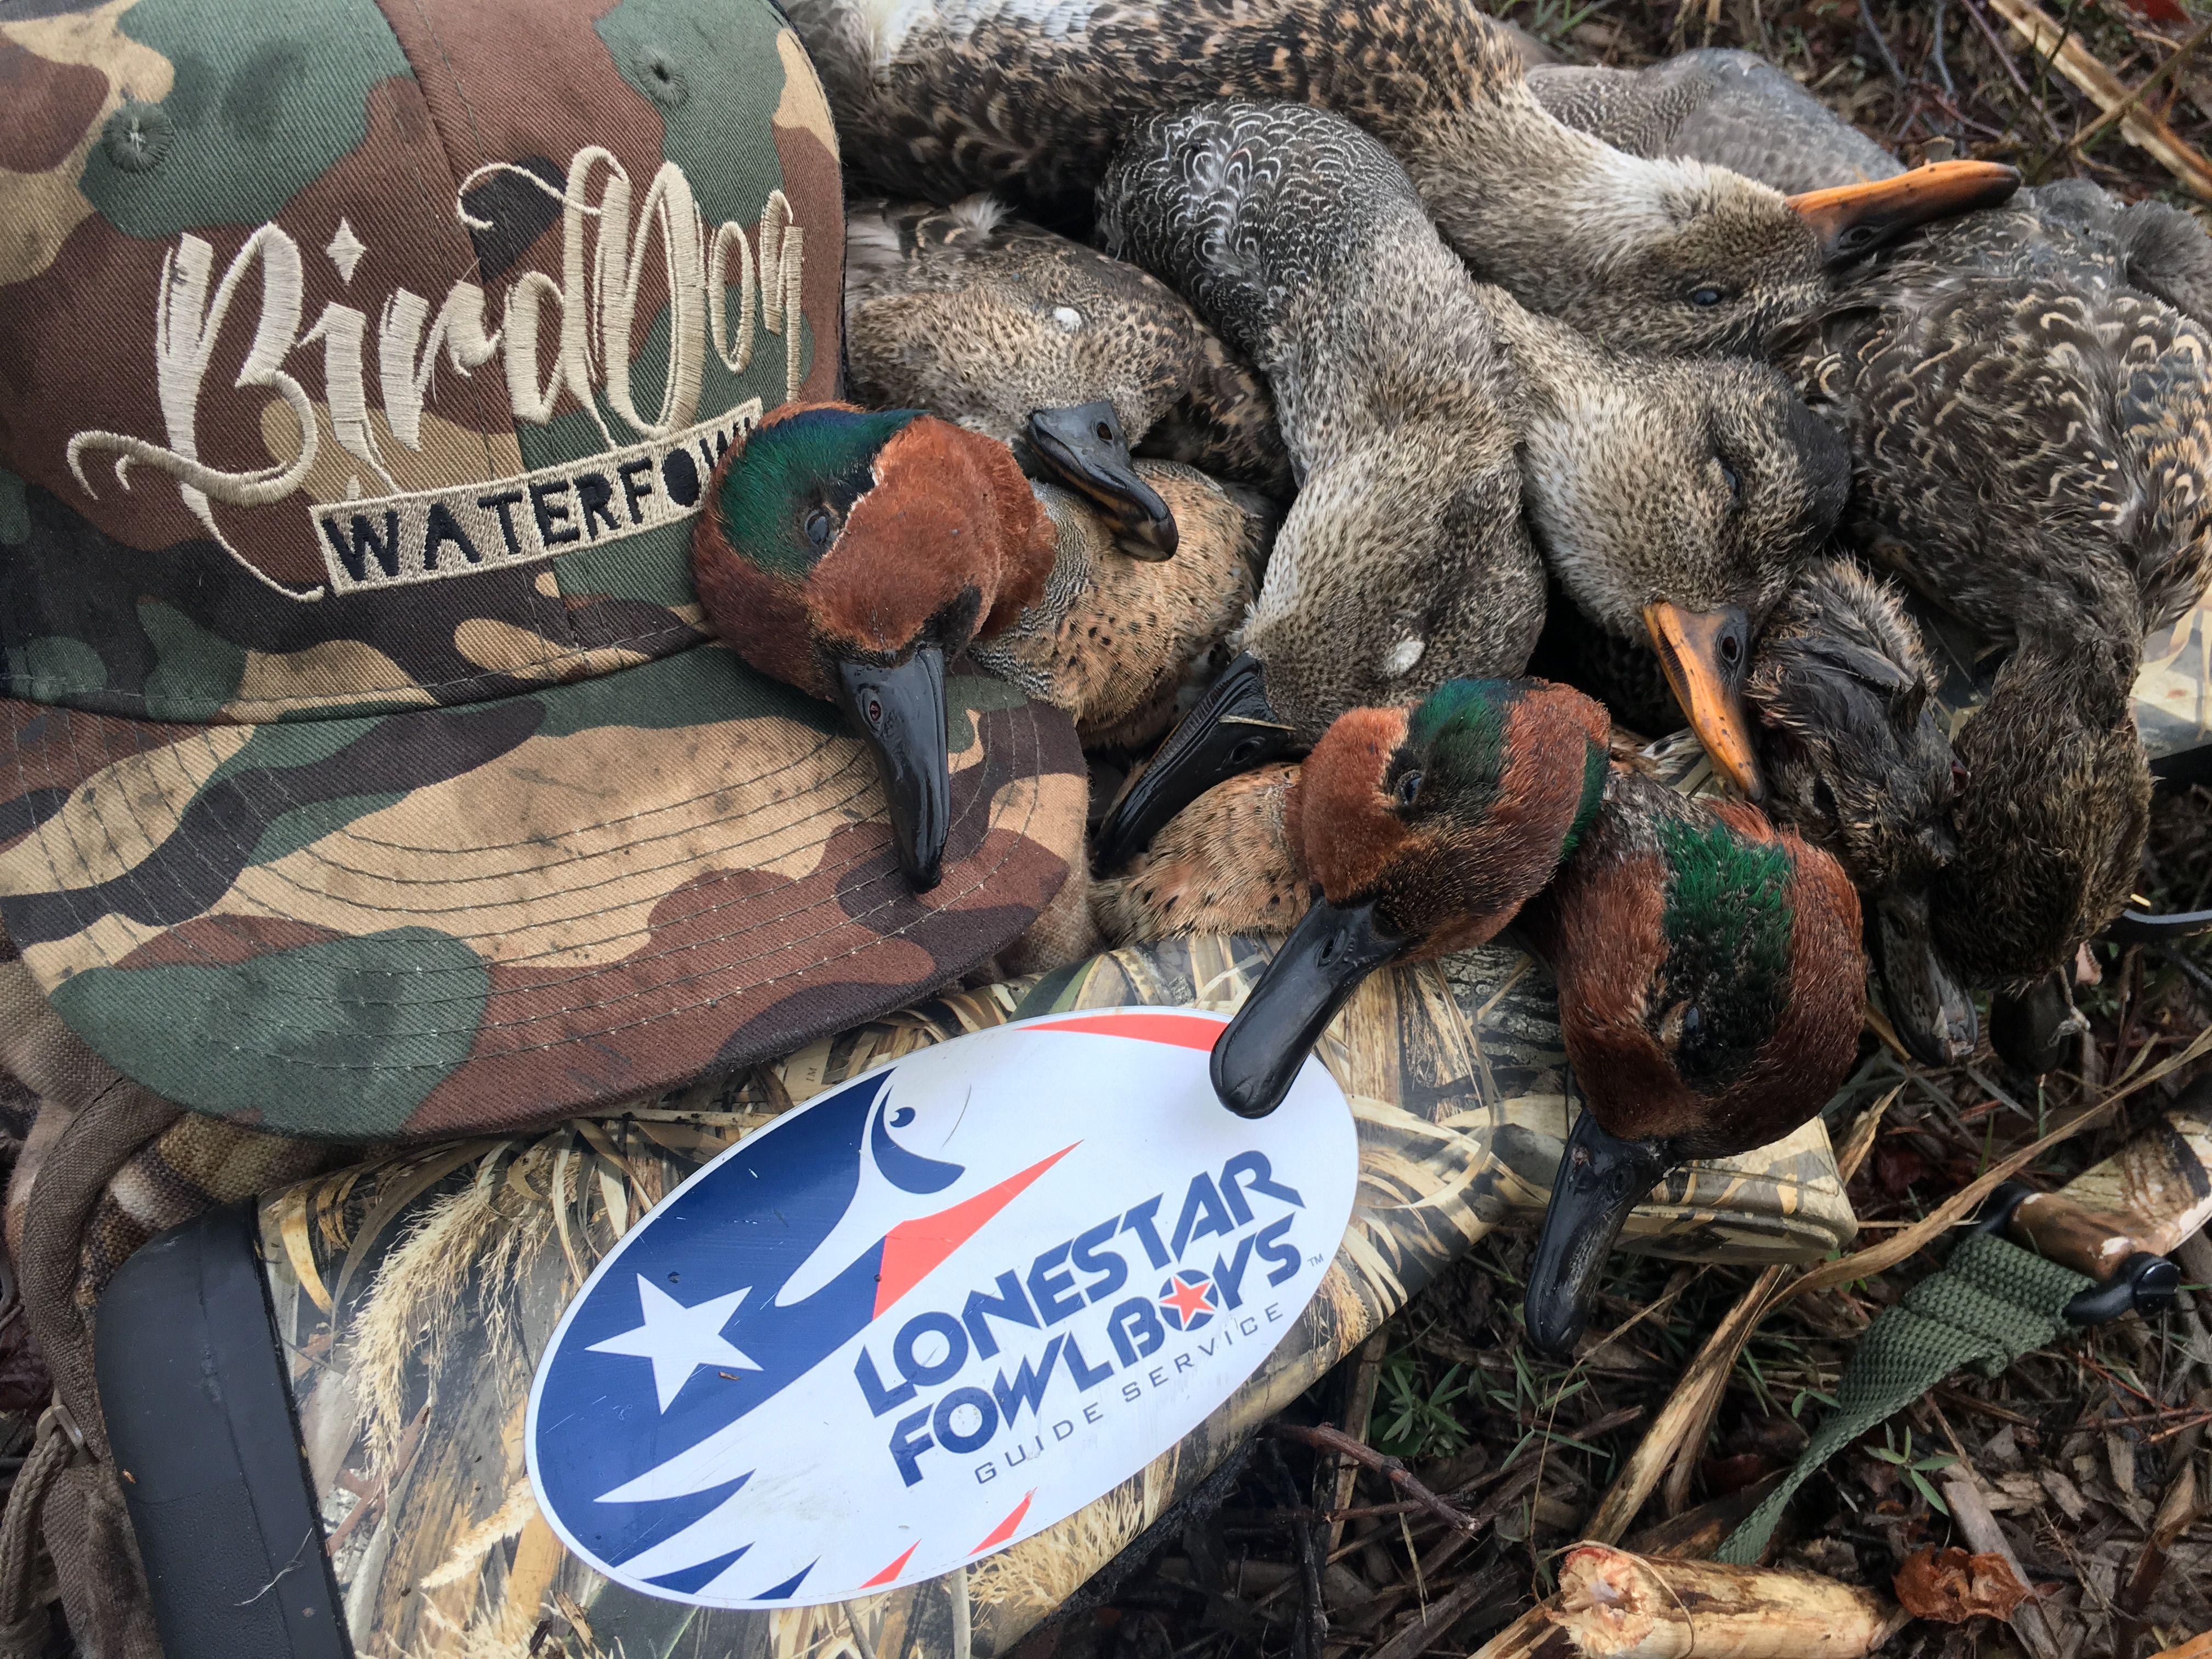 Lone star fowl boys texas duck hunting guide service team up with lone star fowl boys texas duck hunting guide service team up with bird dog waterfowl apparel sciox Choice Image